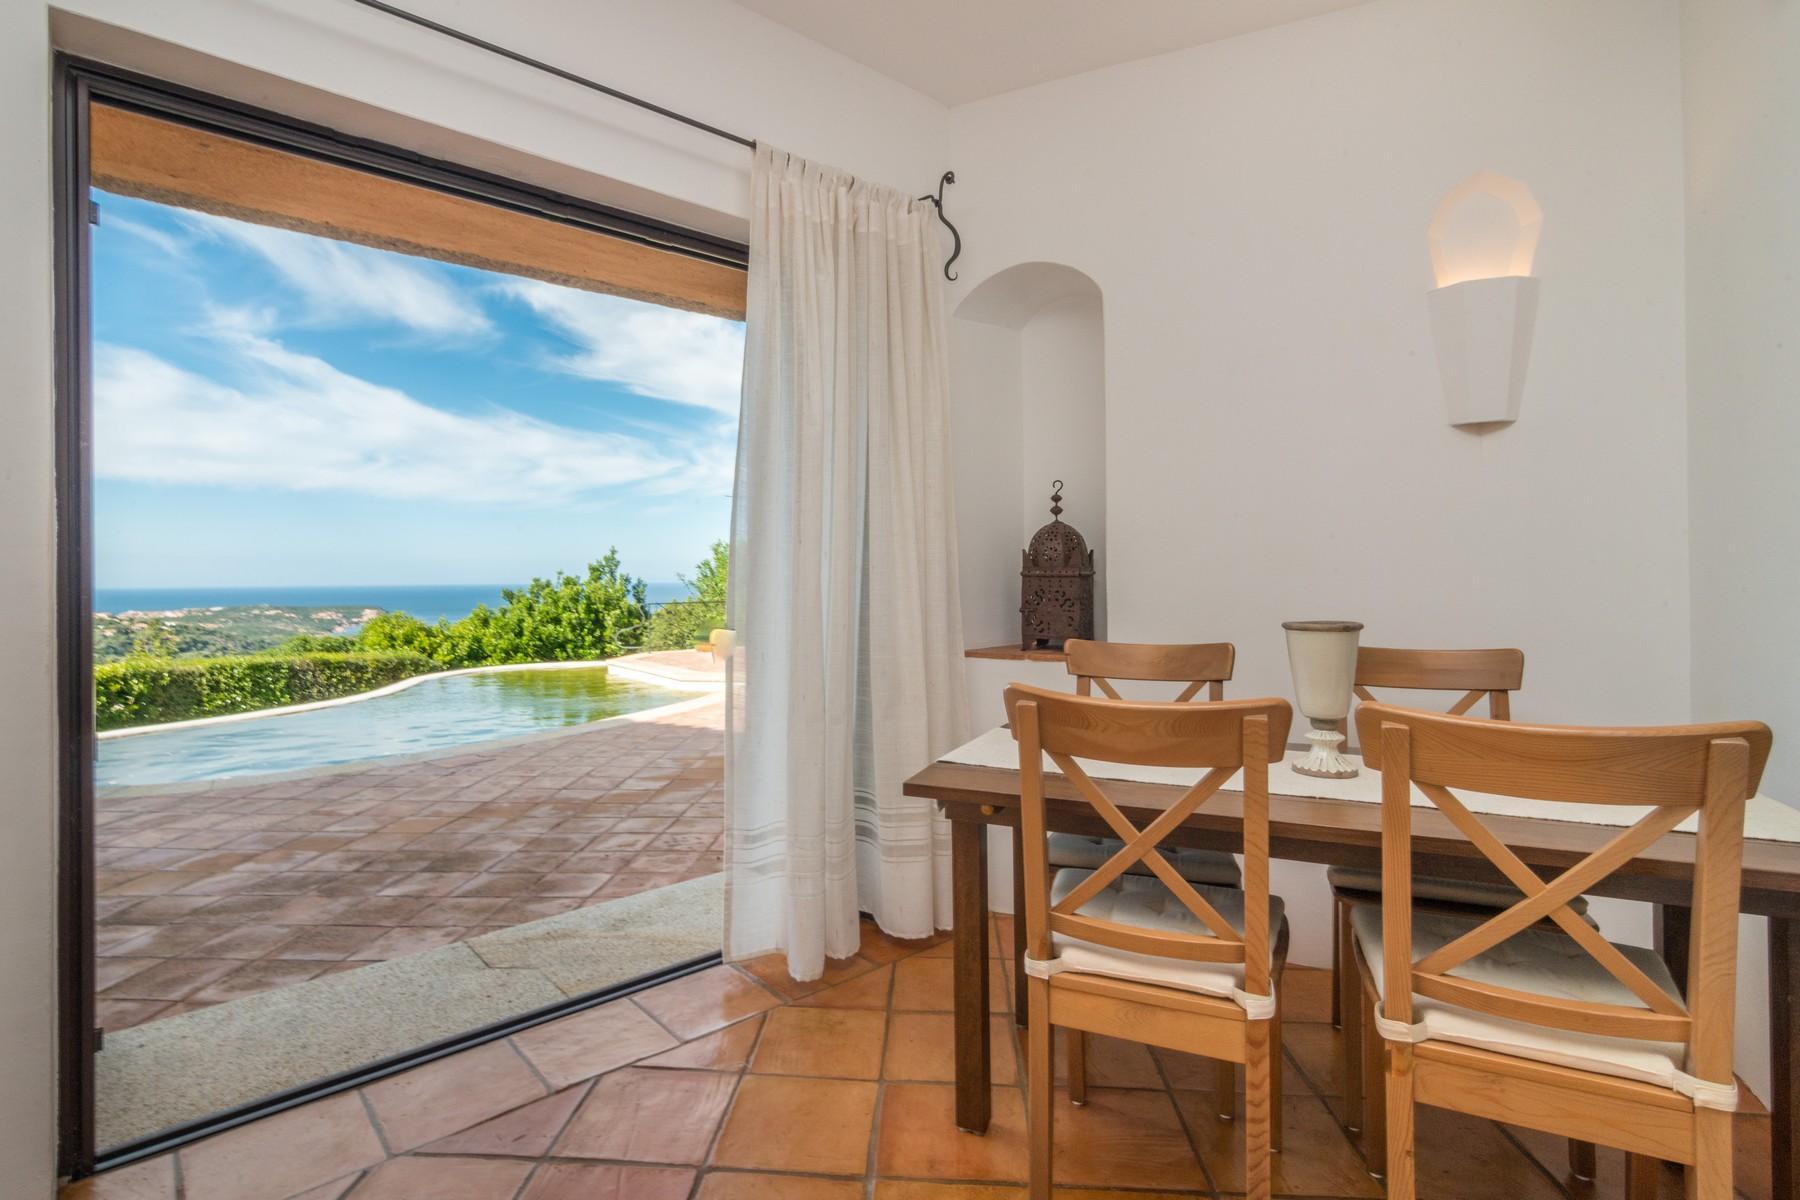 Porto Cervo Abbiadori Splendide villa jumelée avec vue sur le golfe de Pevero - 13